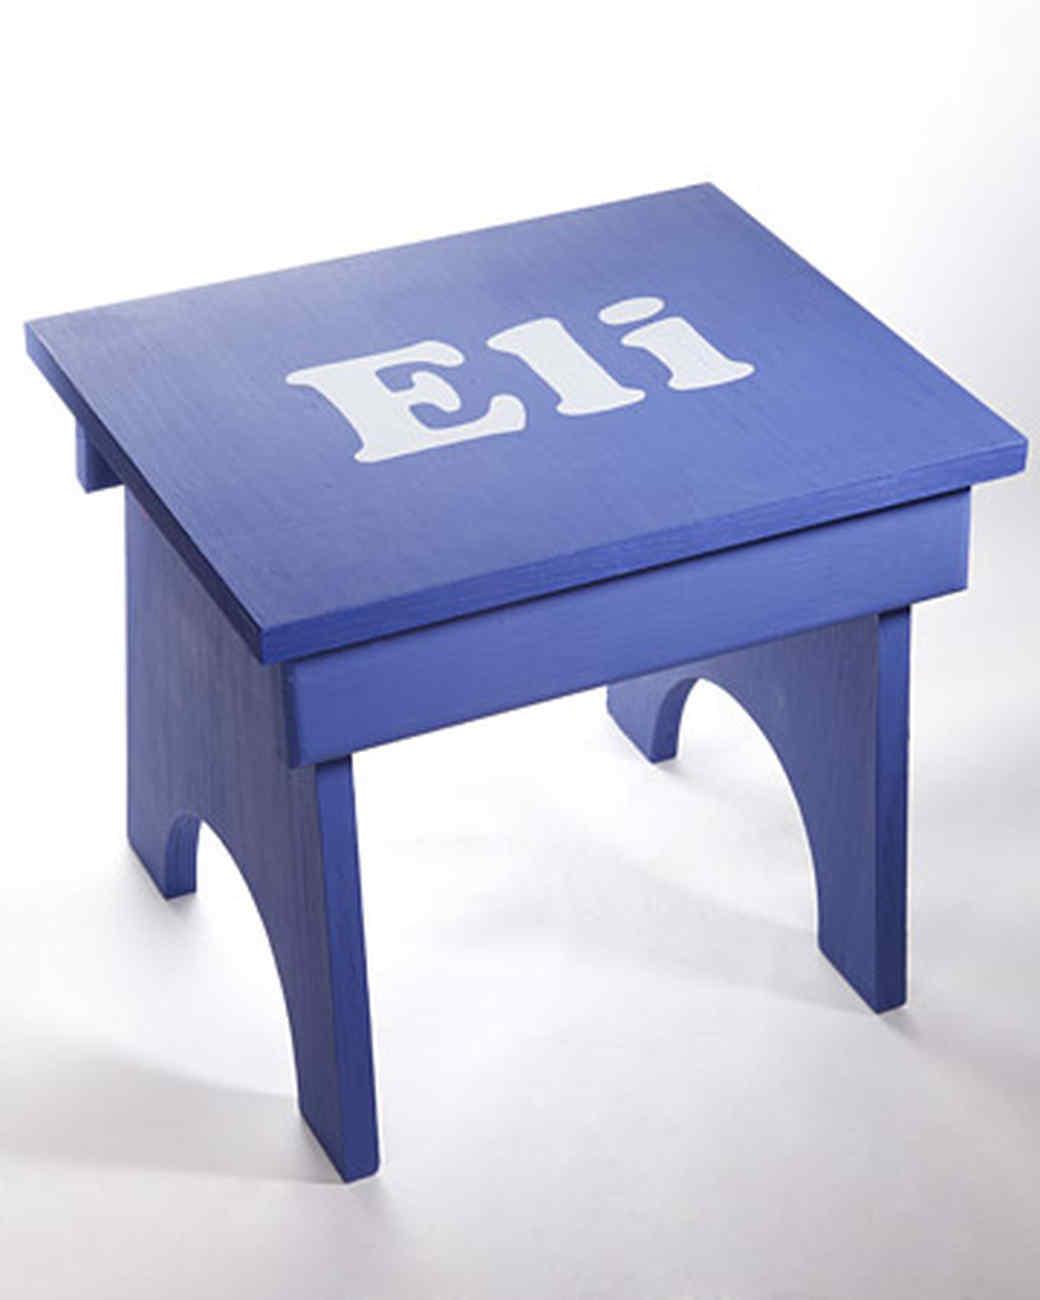 4073_010708_stool.jpg